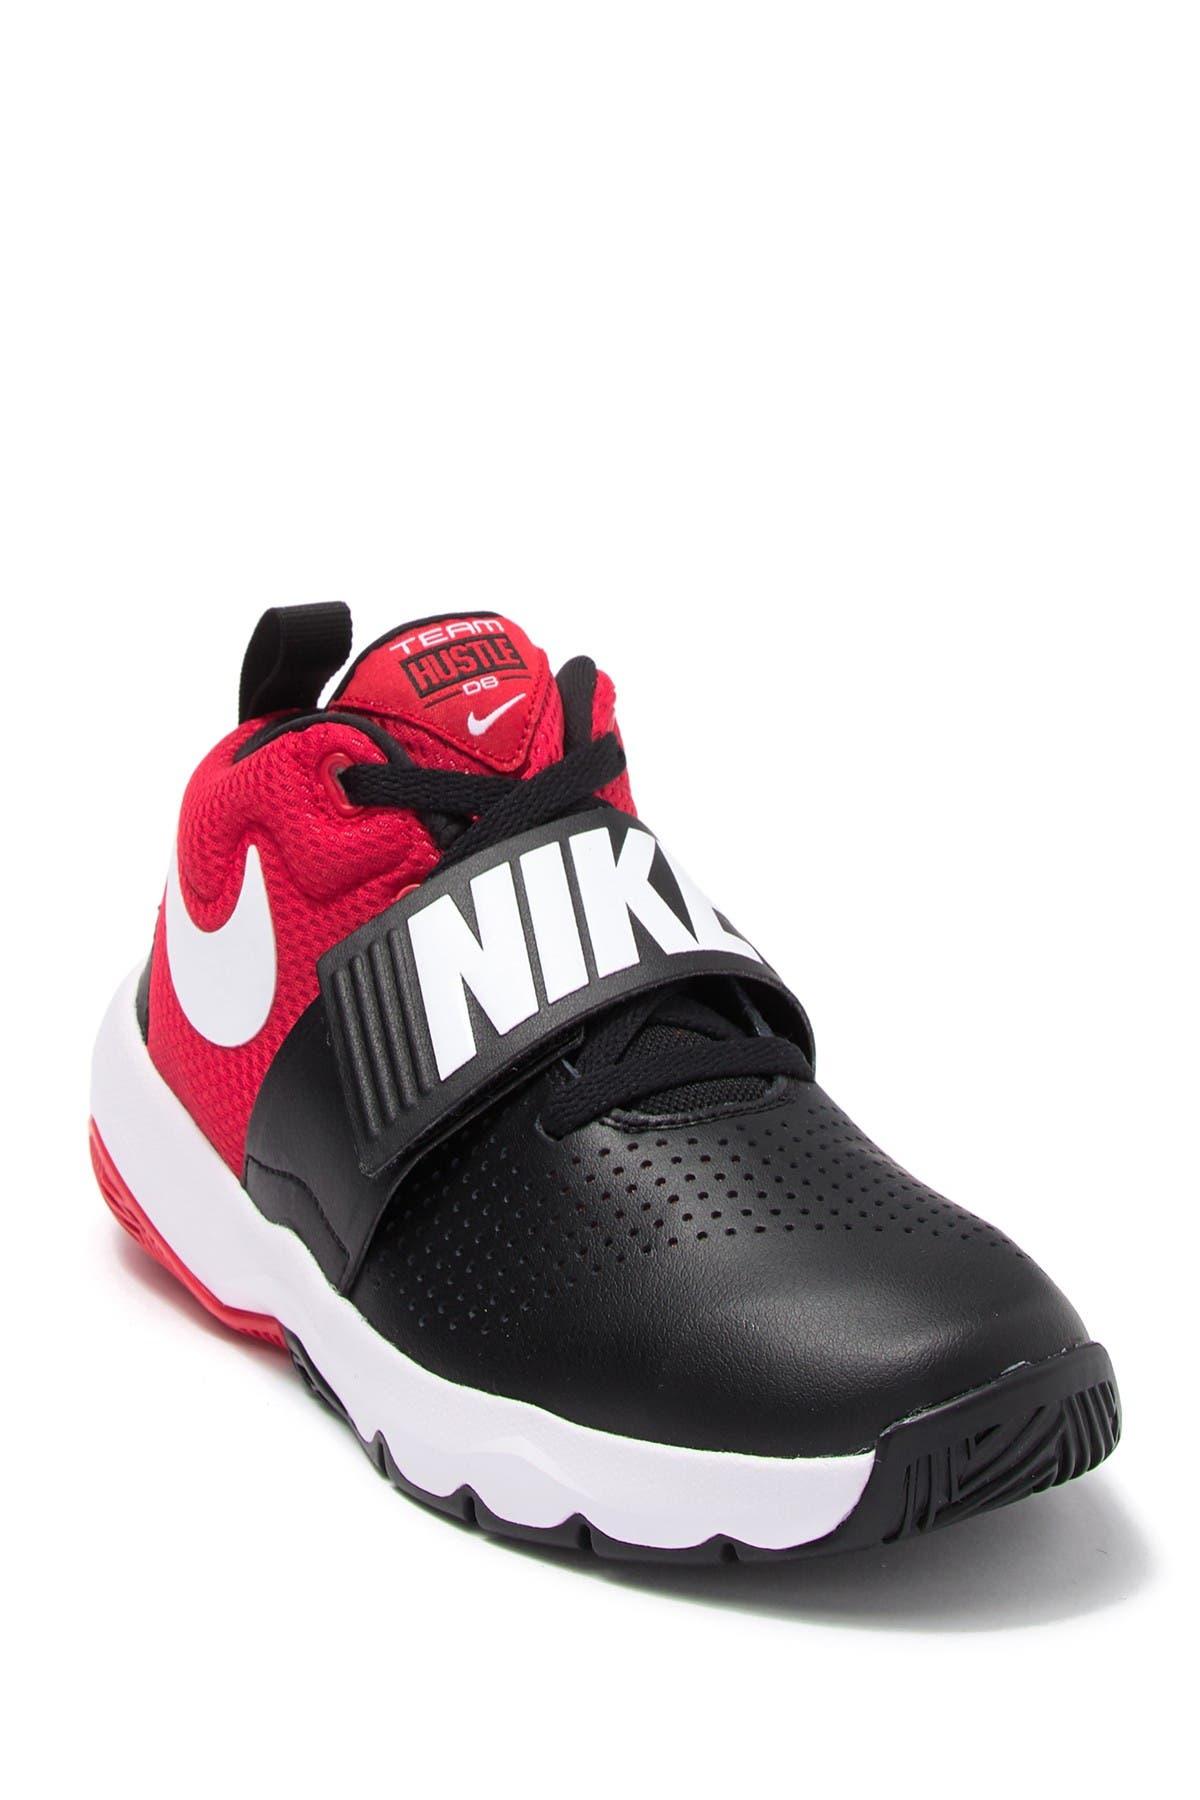 Nike | Team Hustle D8 Sneaker